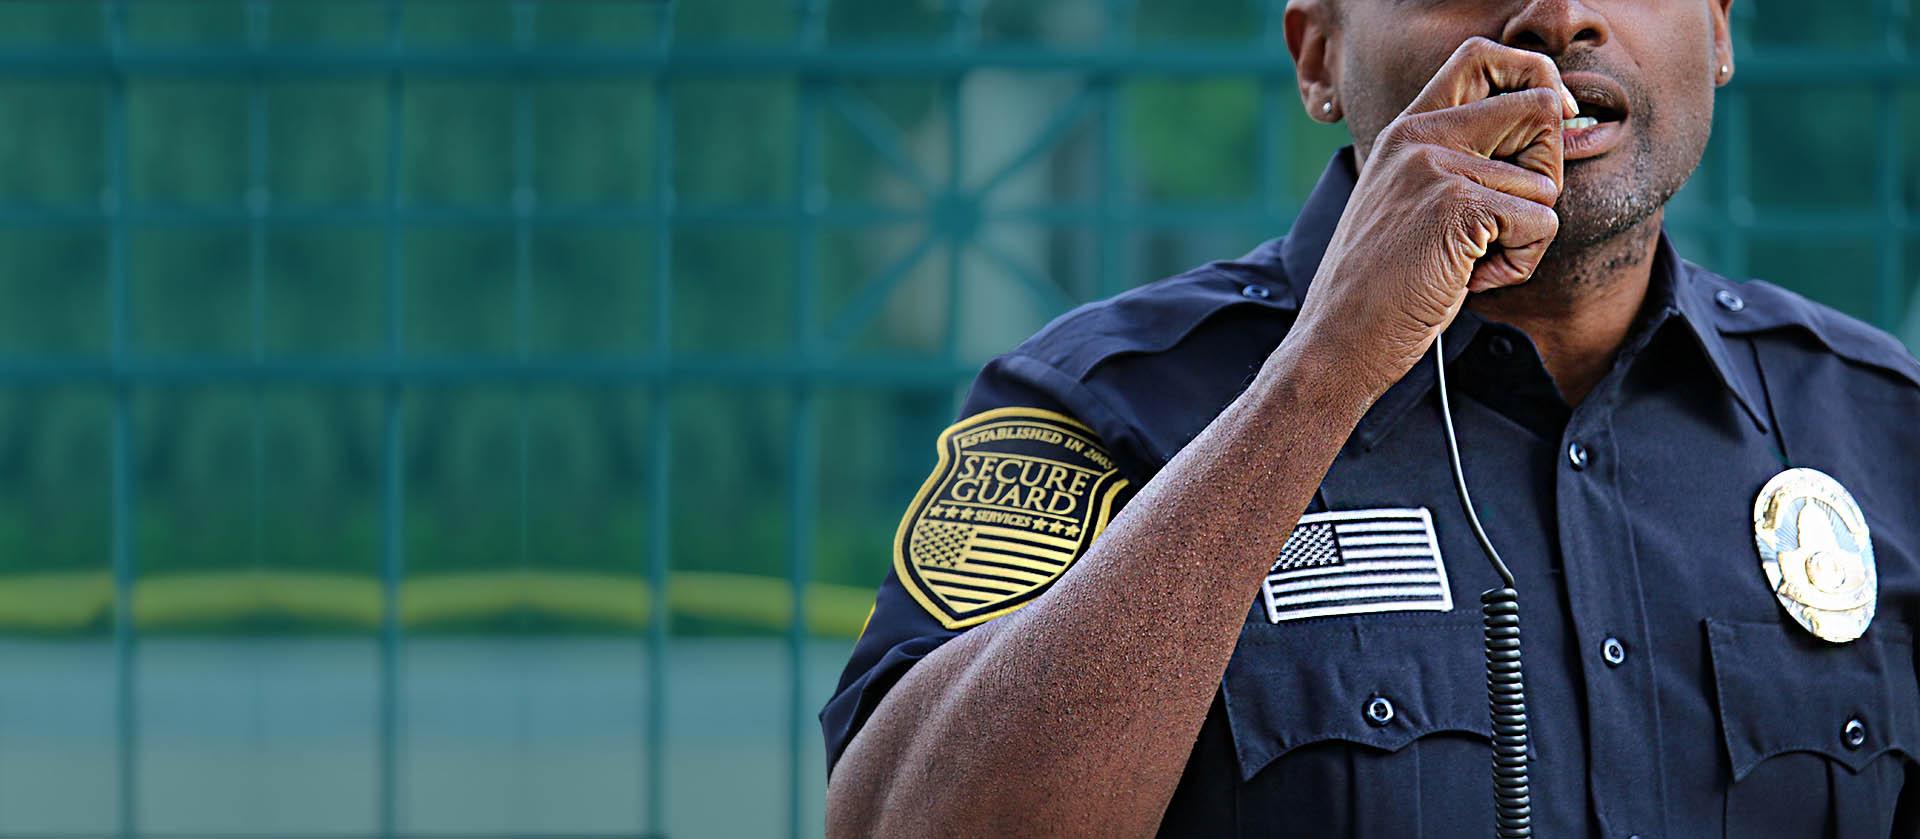 Secruity Guard Slider_SG3